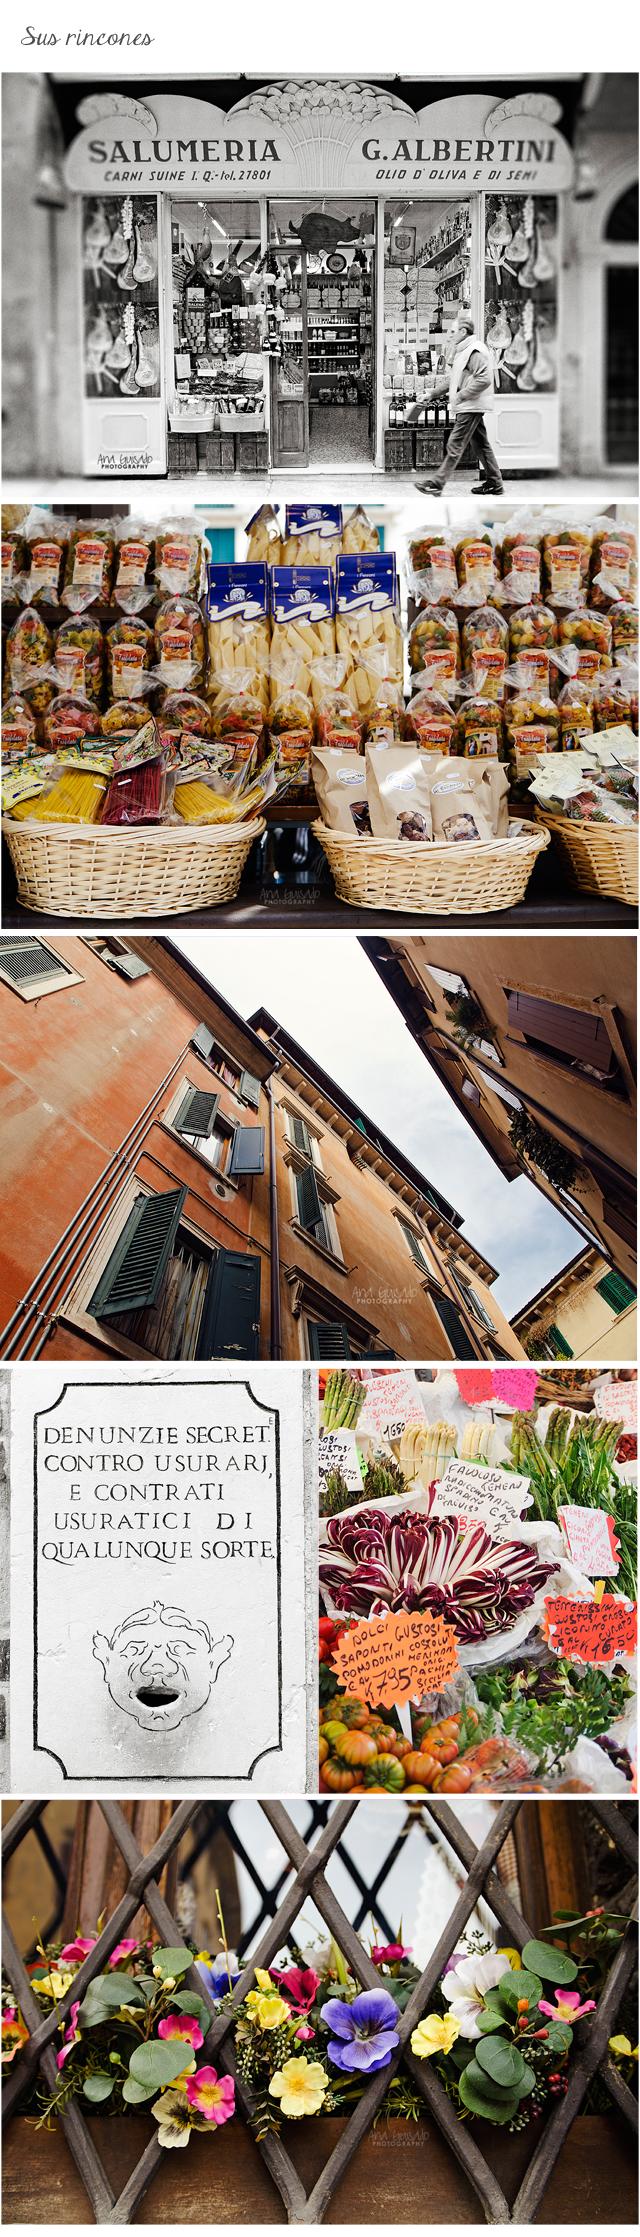 20130323_Verona_2